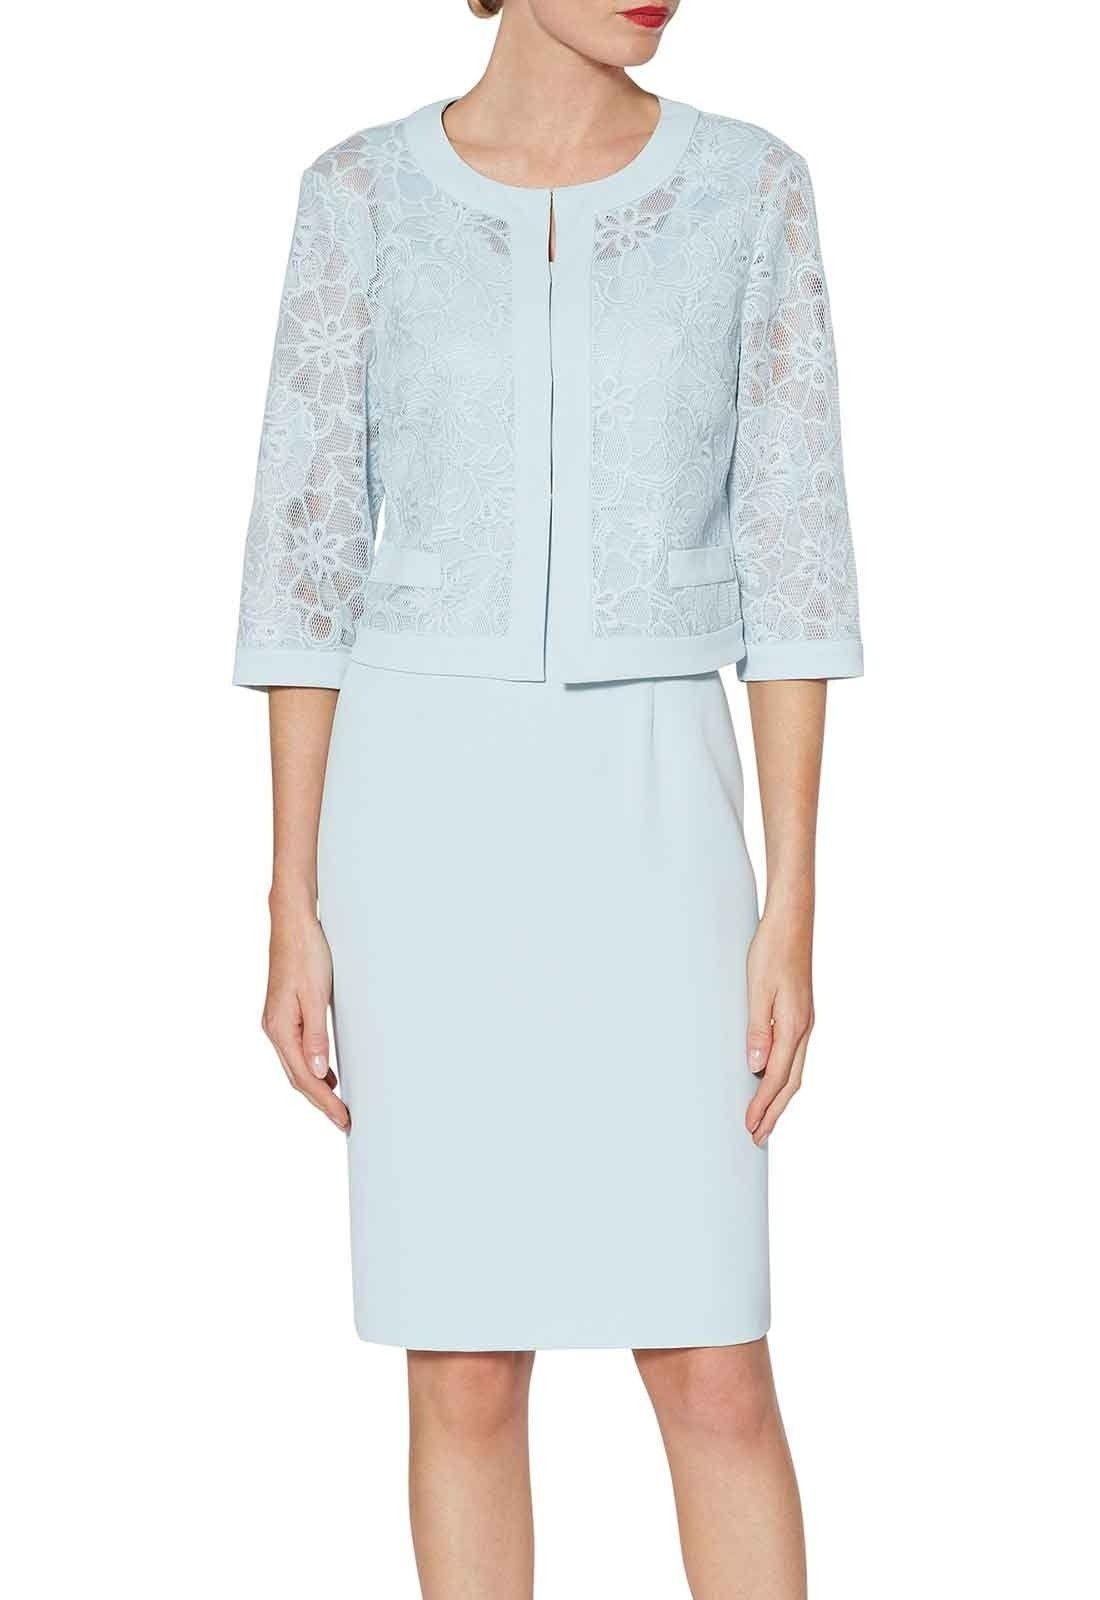 927370a546fef0 Gina Bacconi Trixie Dress And Embroidered Jacket in Blue   Kazak yakası    Embroidered jacket, Dresses, Lace jacket